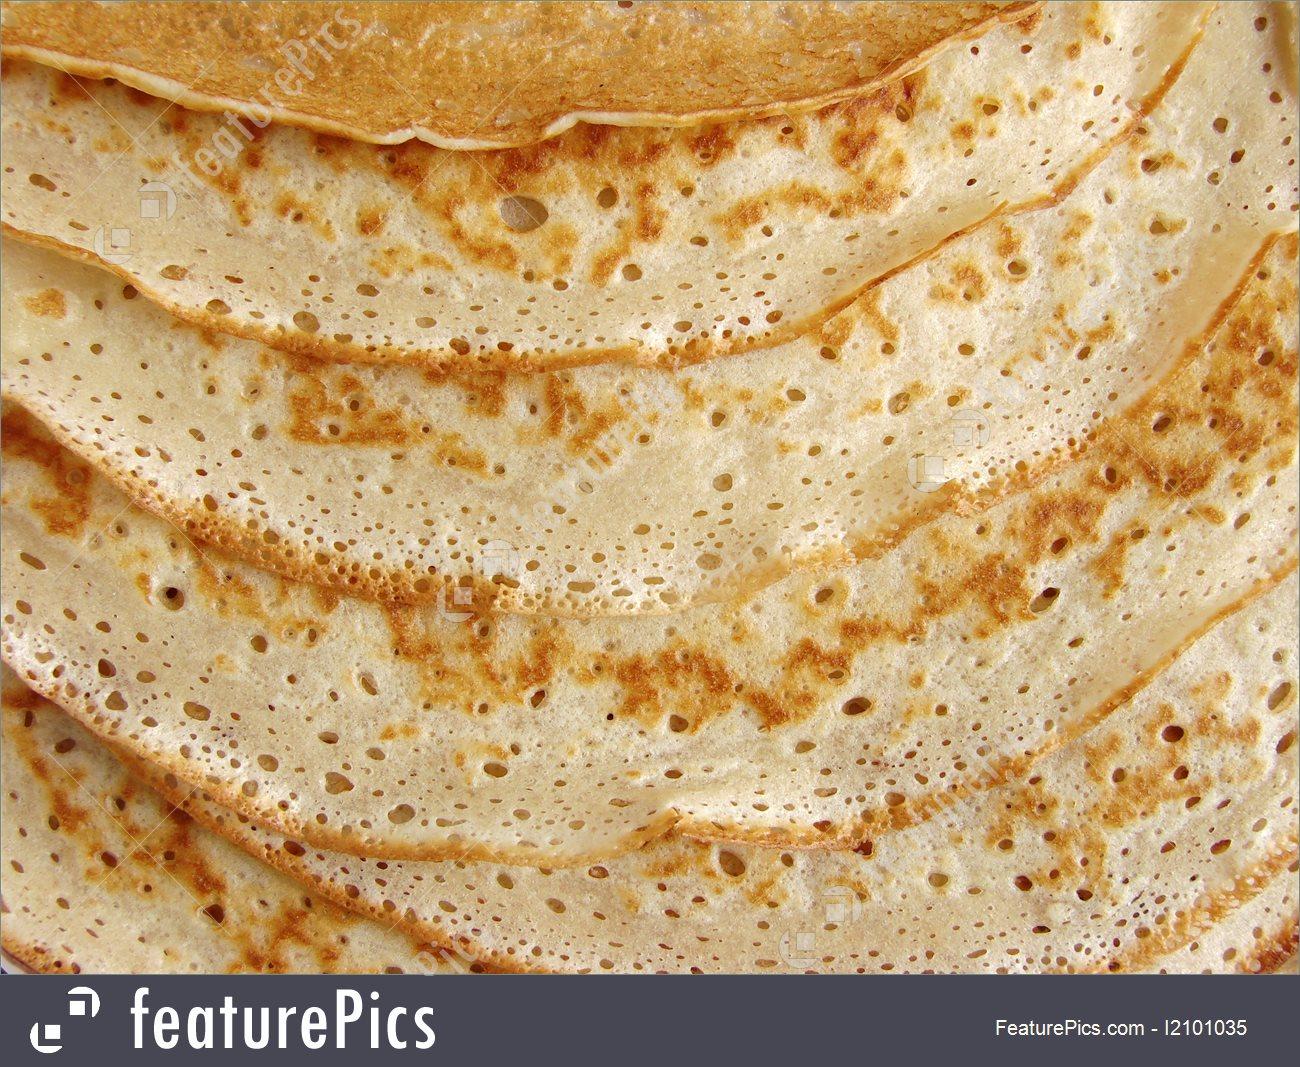 Desserts Pancakes Background   Stock Image I2101035 at FeaturePics 1300x1067